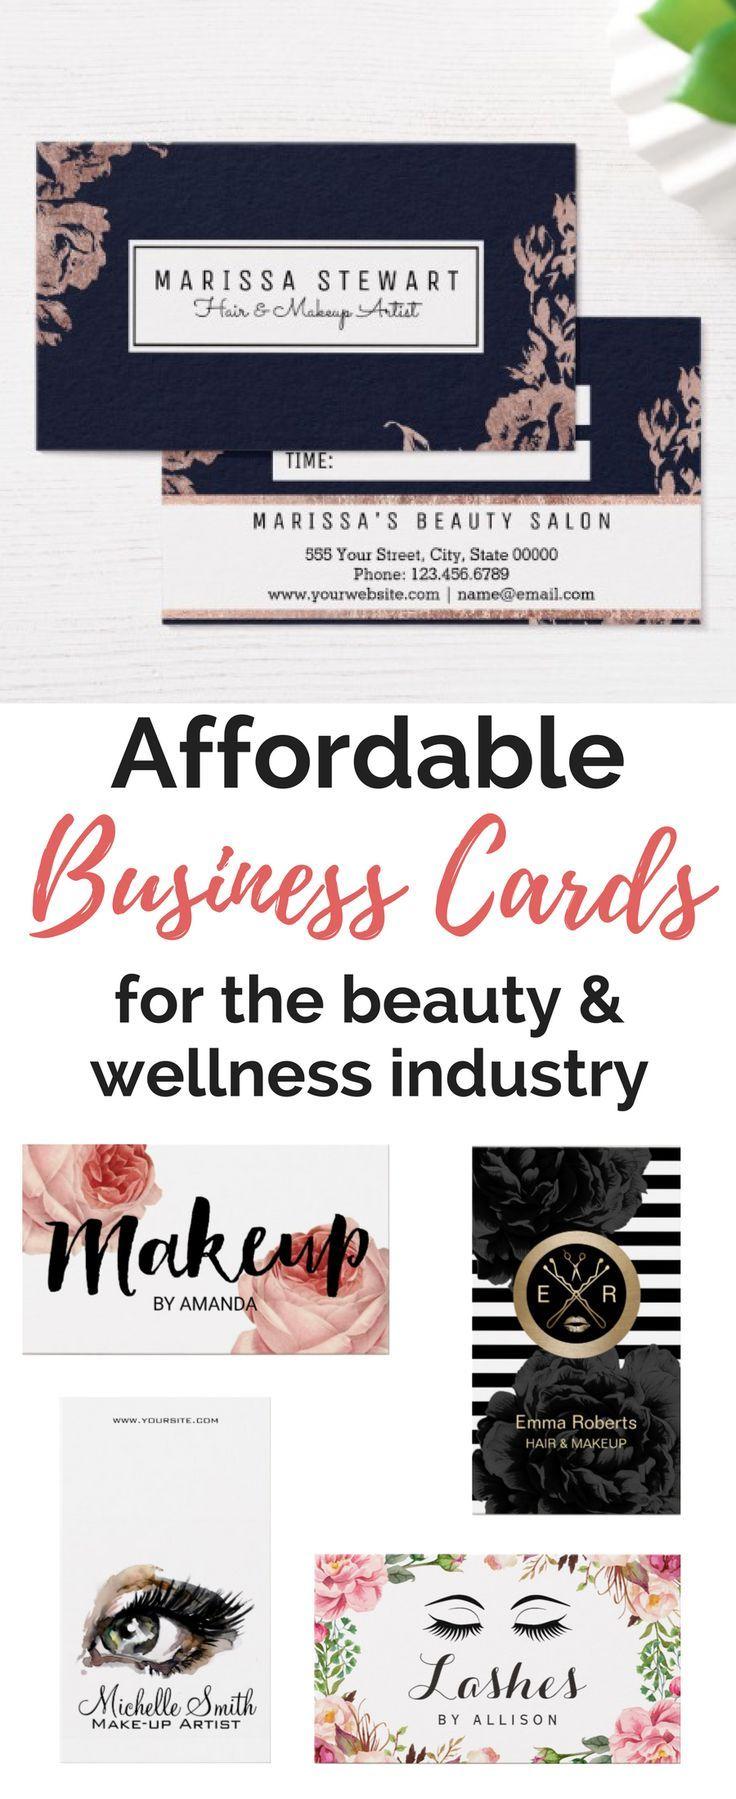 affordable business cards for salons spas best business cards pinterest salons business and hairstylist business cards - Affordable Business Cards